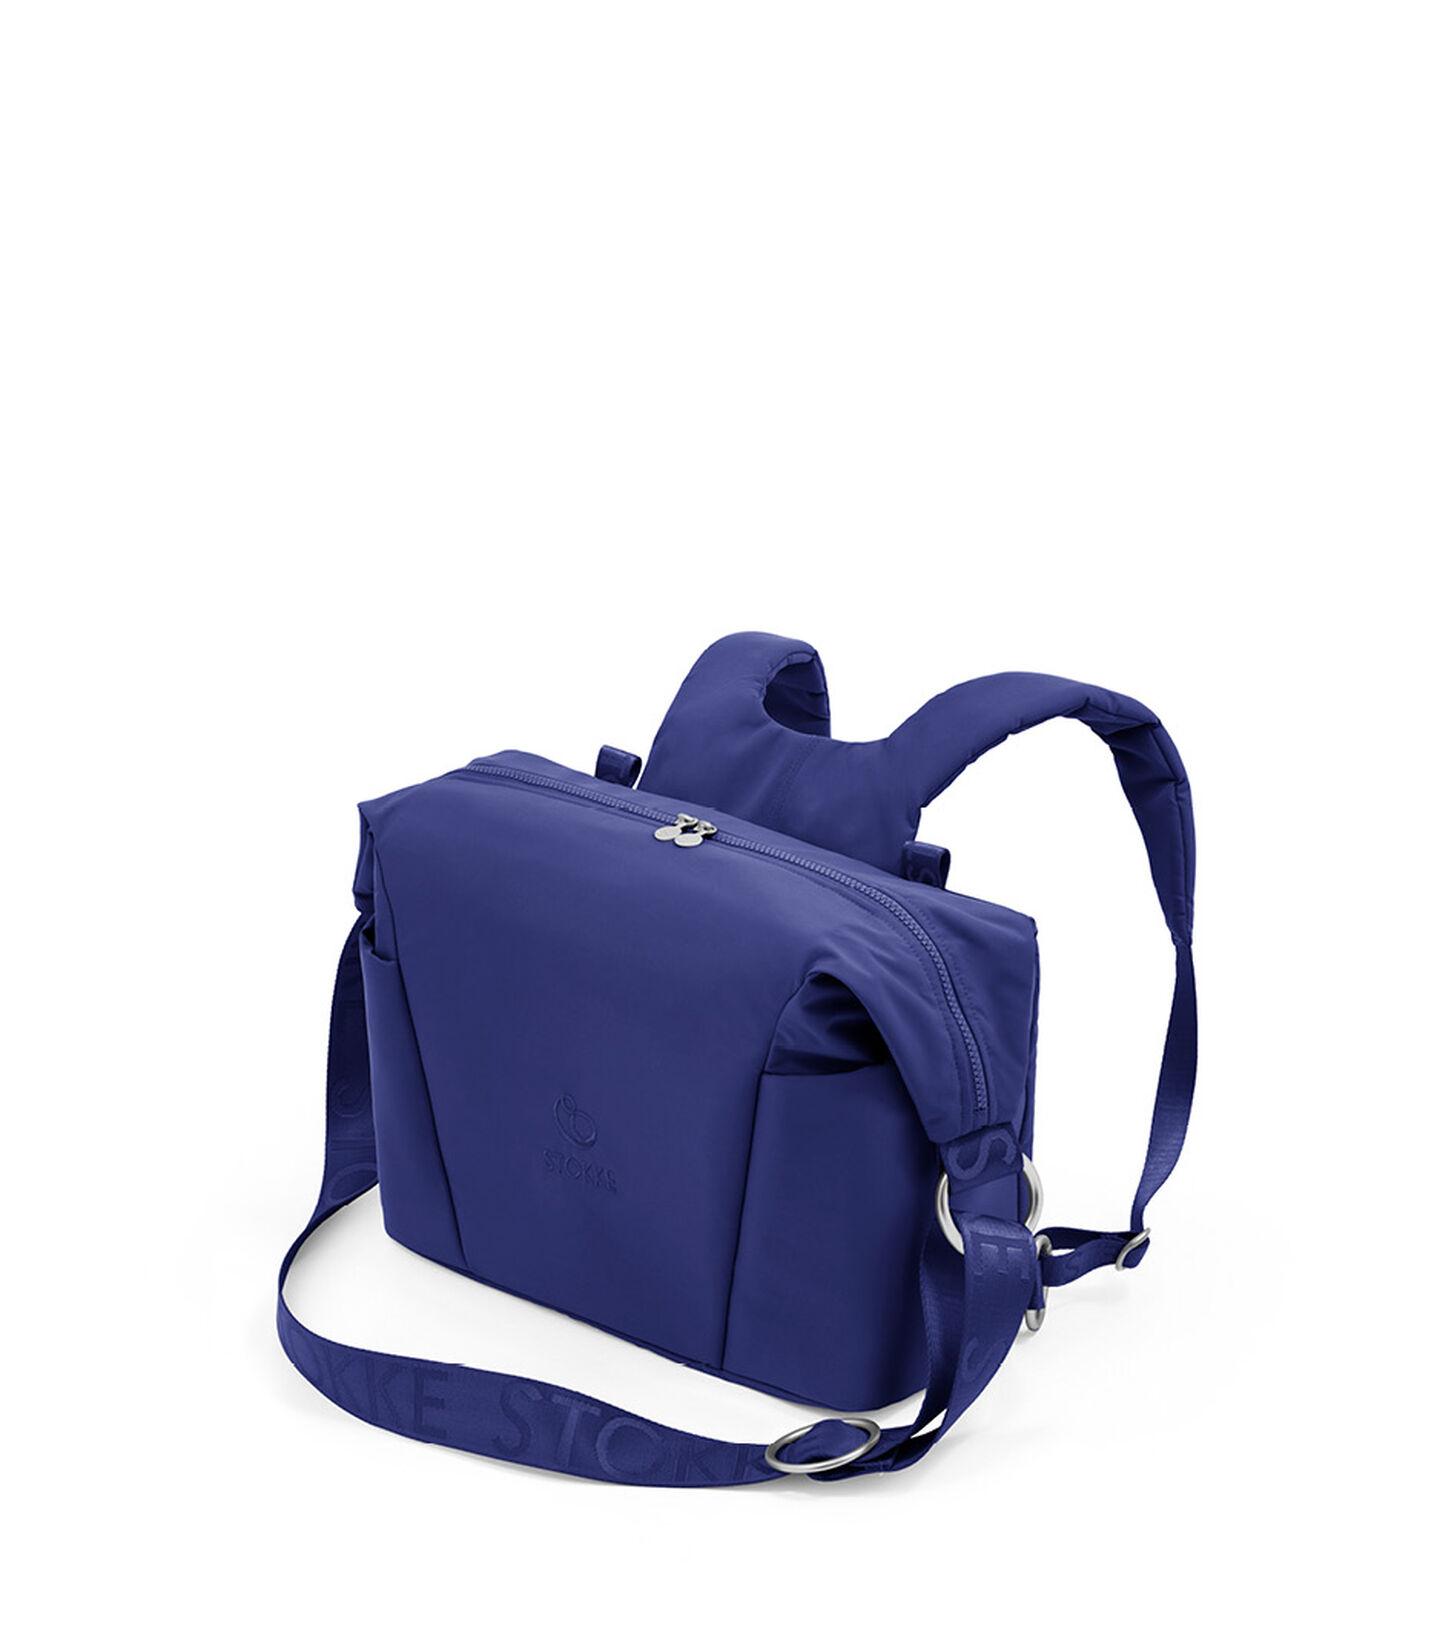 Stokke® Xplory® X-skötväska Royal Blue, Royal Blue, mainview view 1